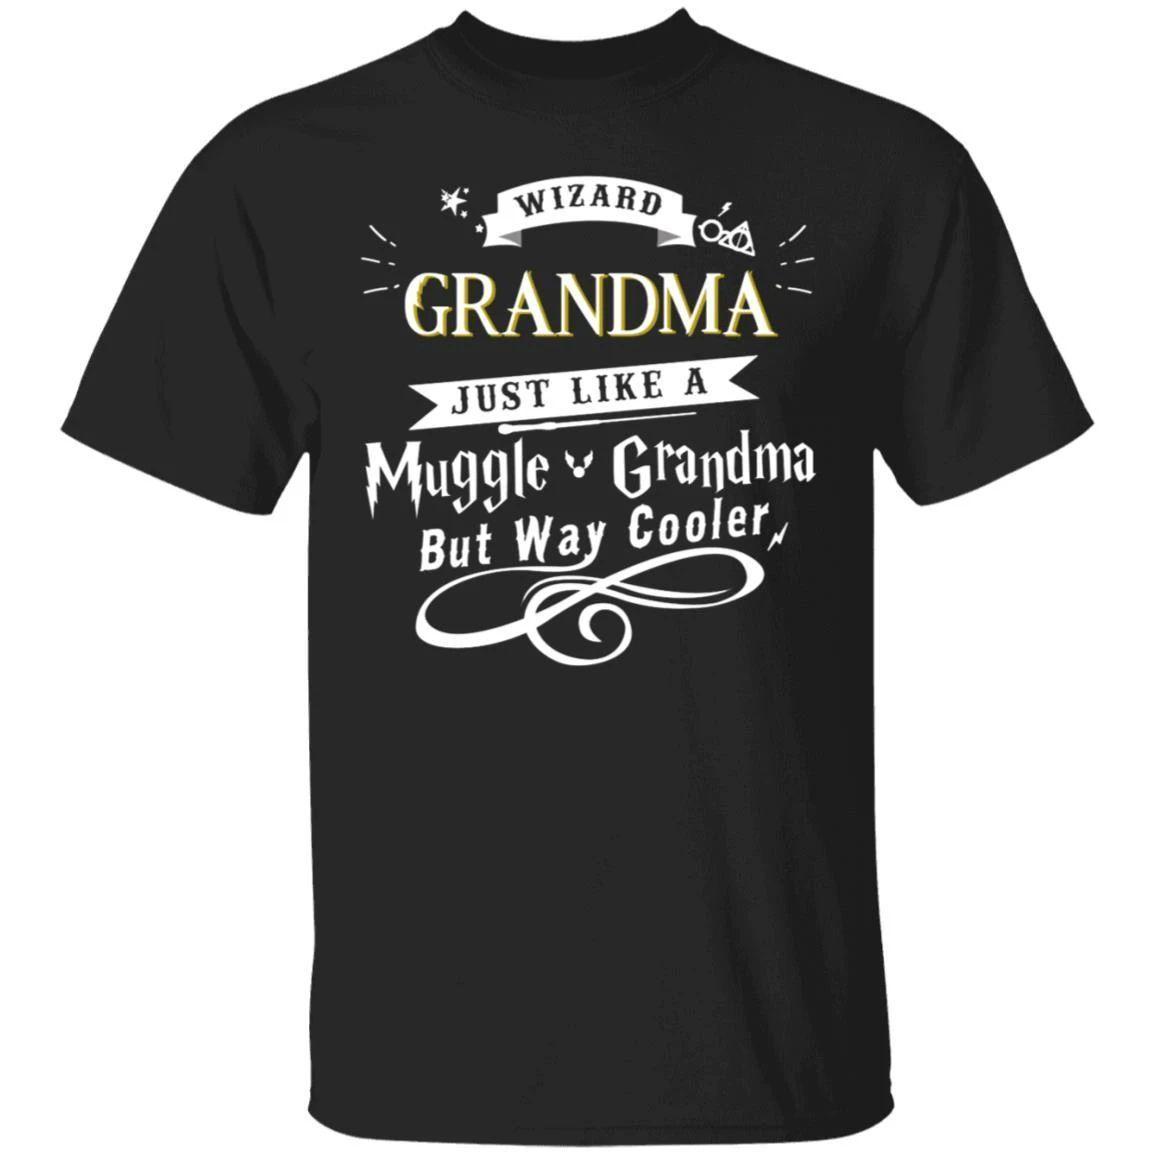 Wizard Grandma Just Like A Muggle Grandma T-shirt Harry Potter Tee